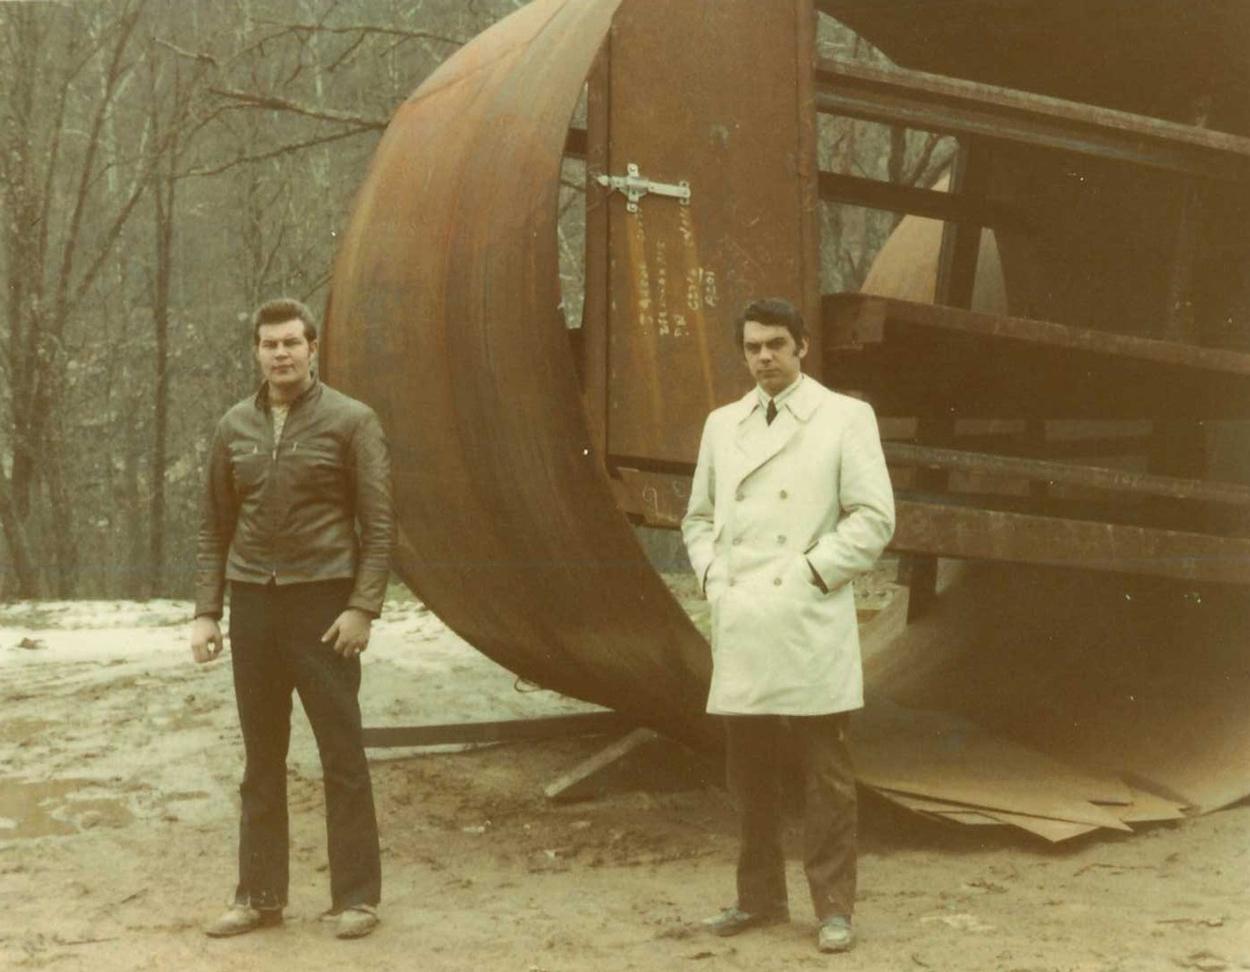 John Rebhan and Mac Clevenstine